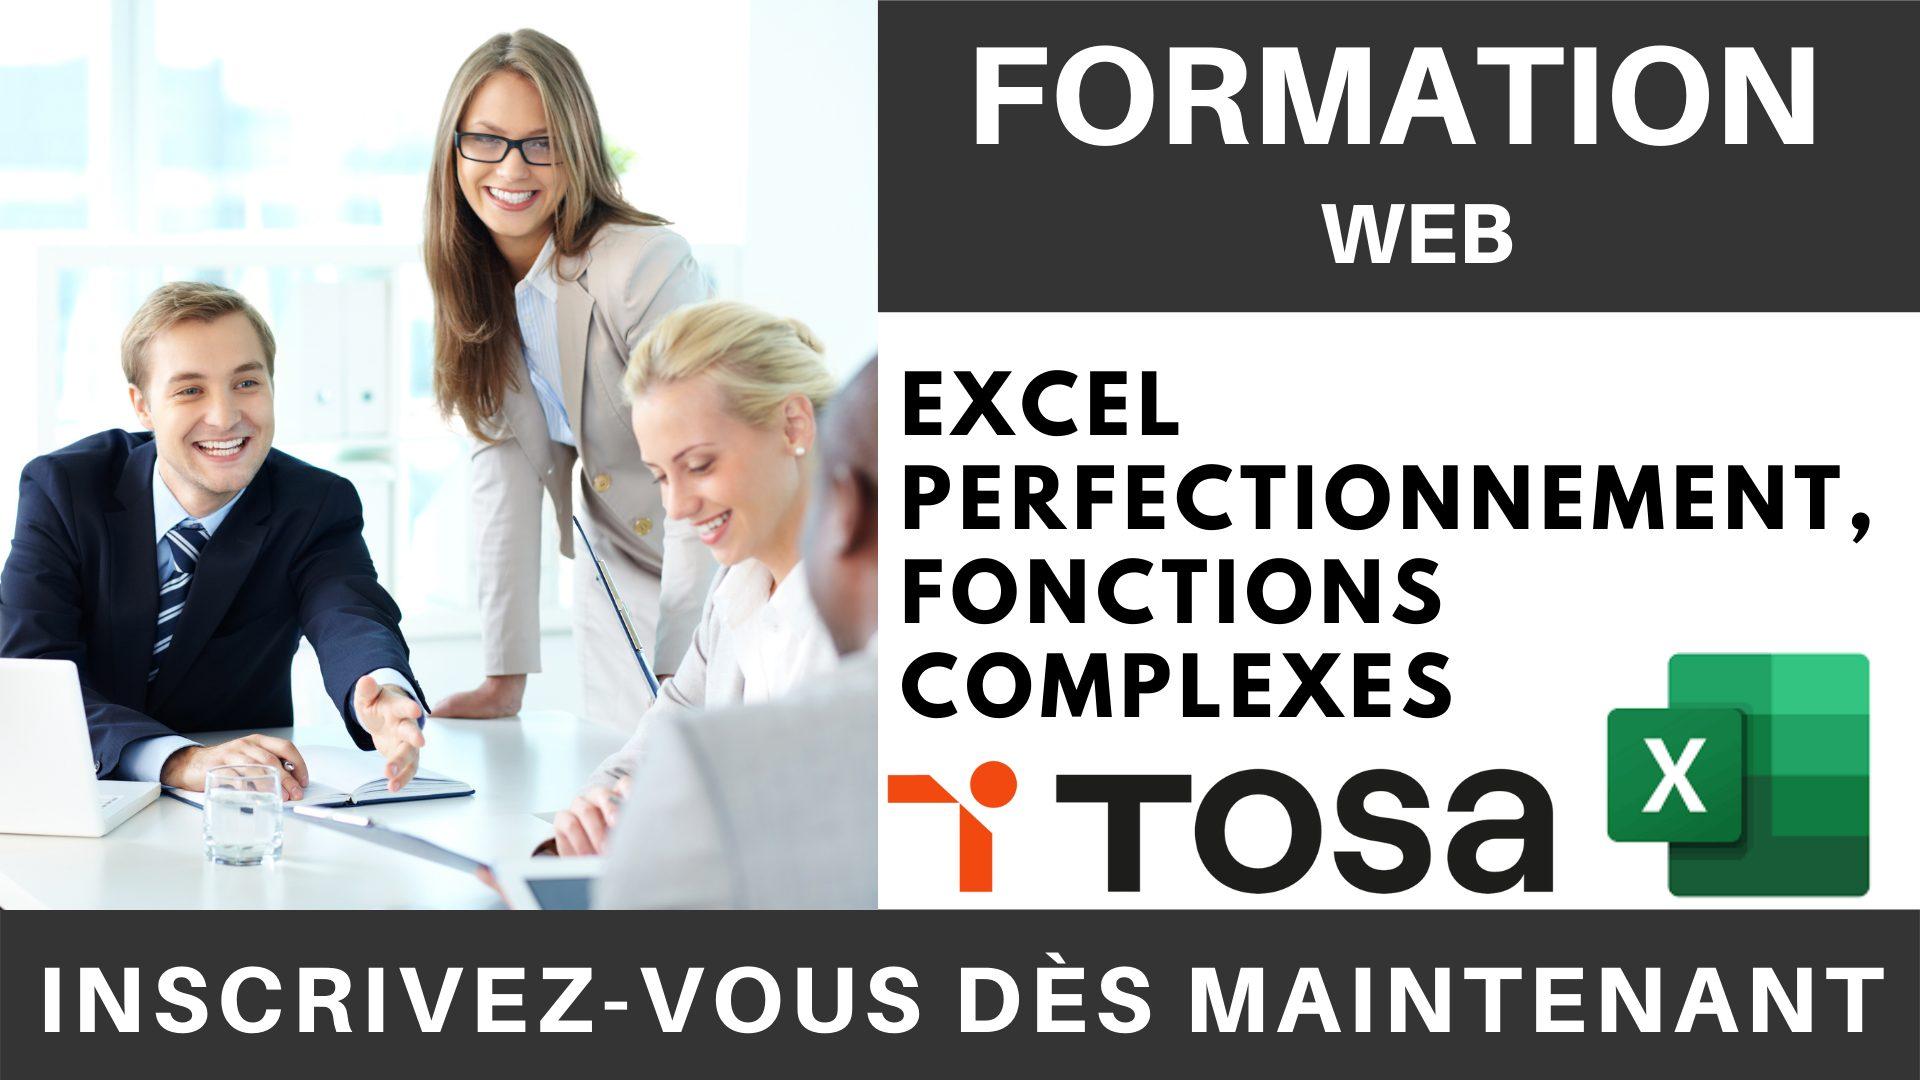 Formation web - Excel Perfectionnement, Fonctions complexes